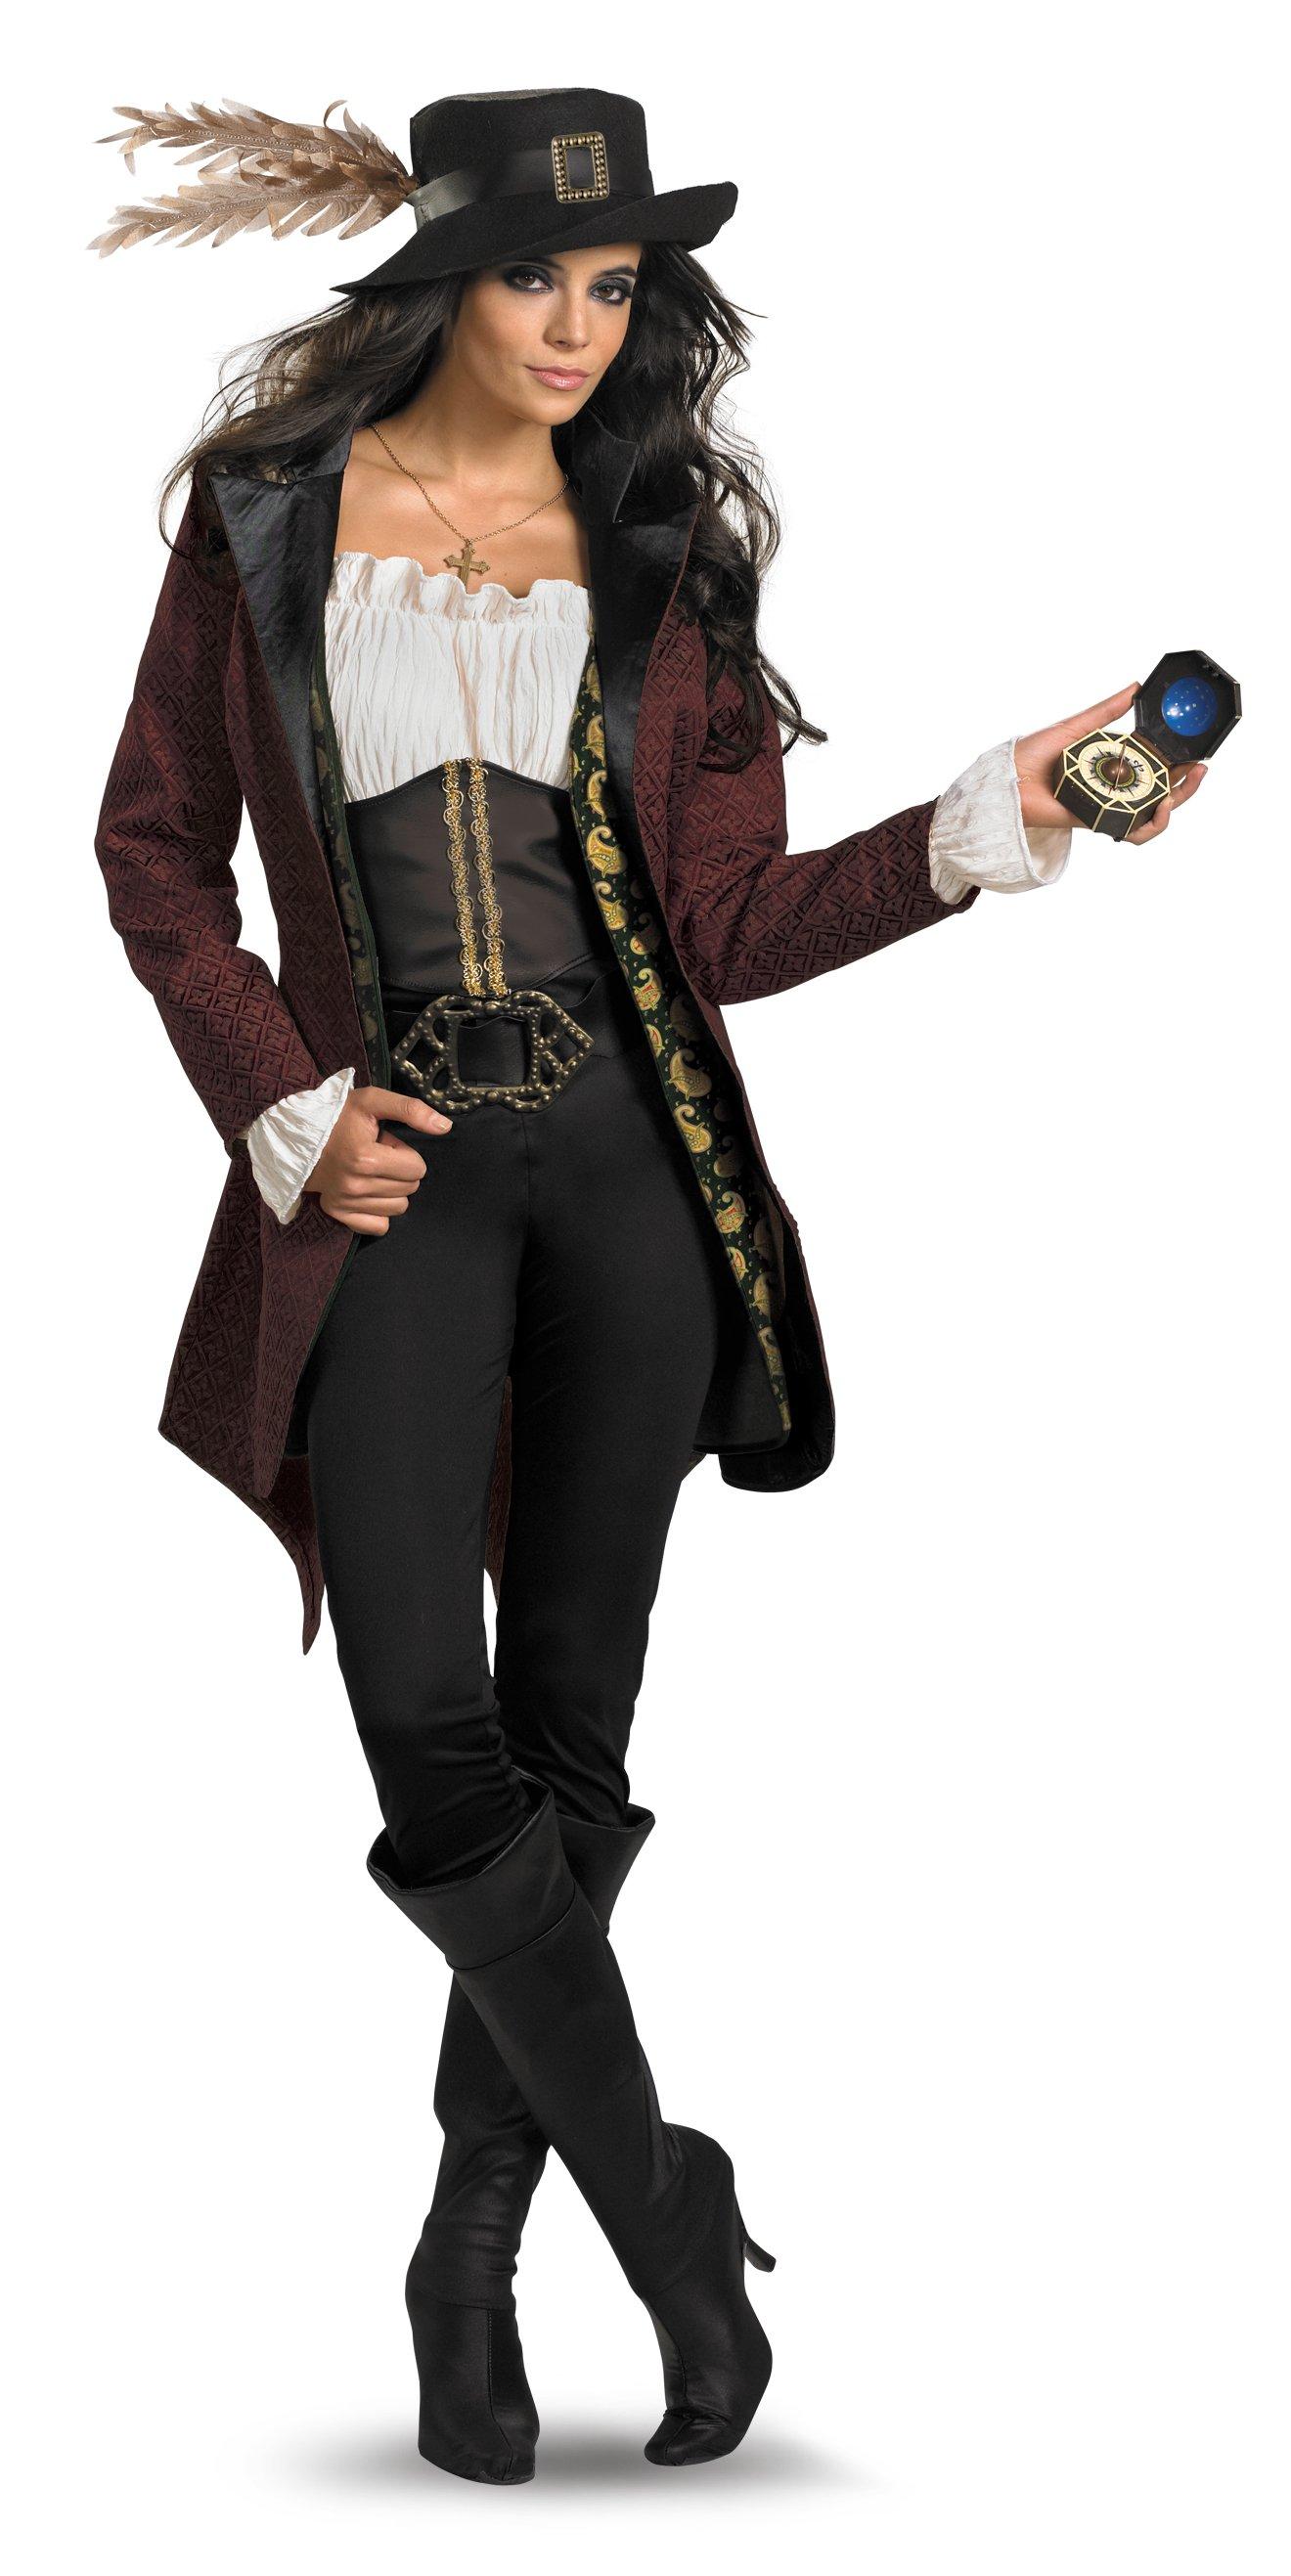 Костюм пирата своими руками взрослый фото